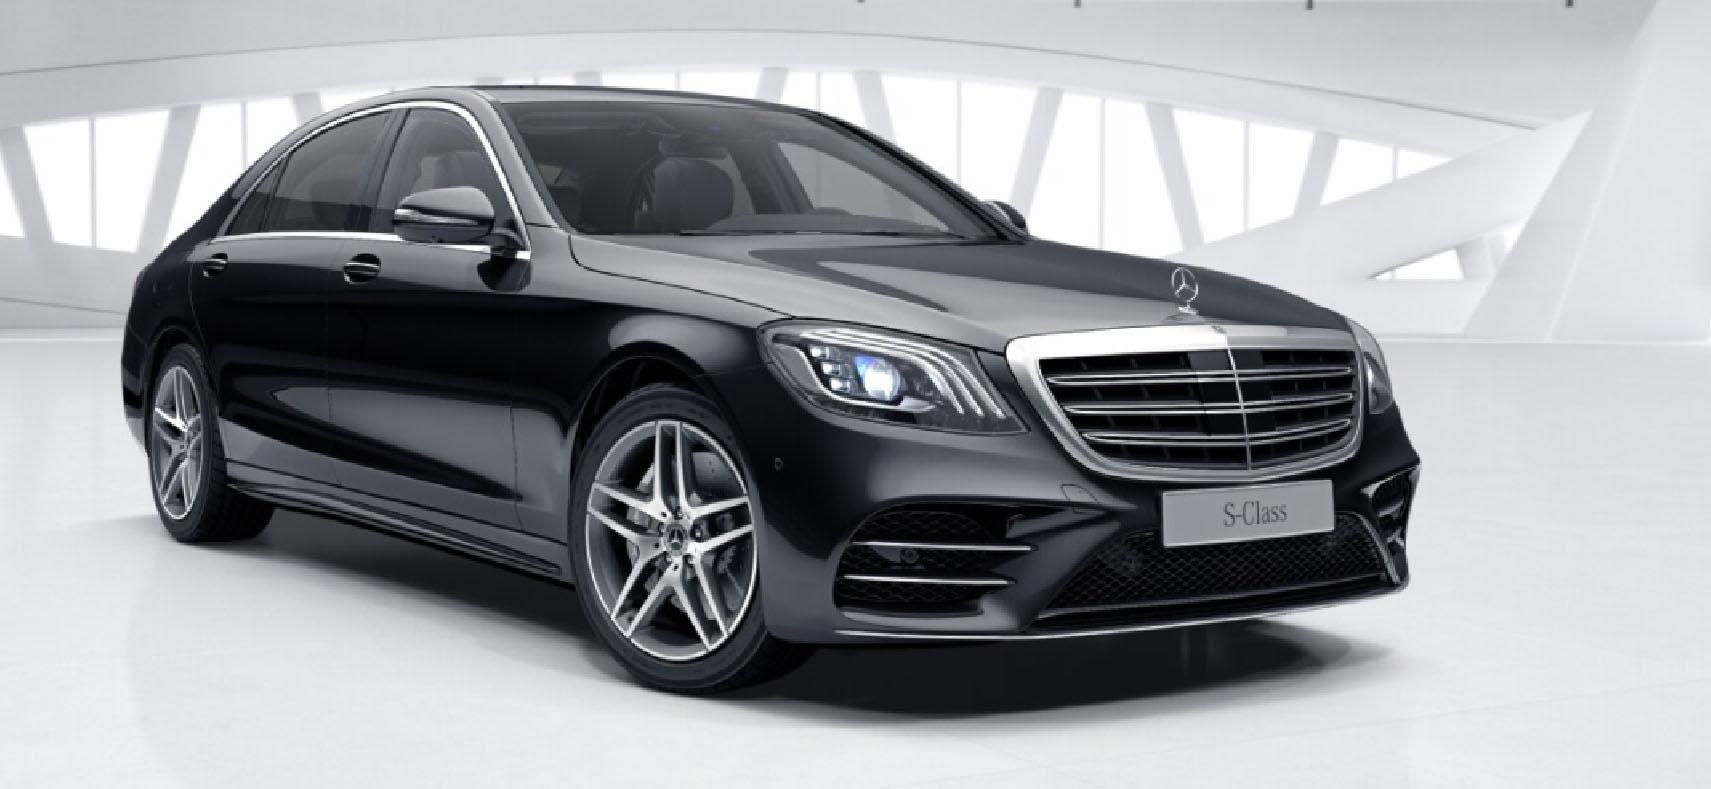 Mercedes-Benz S-Class Limousine 0052600174